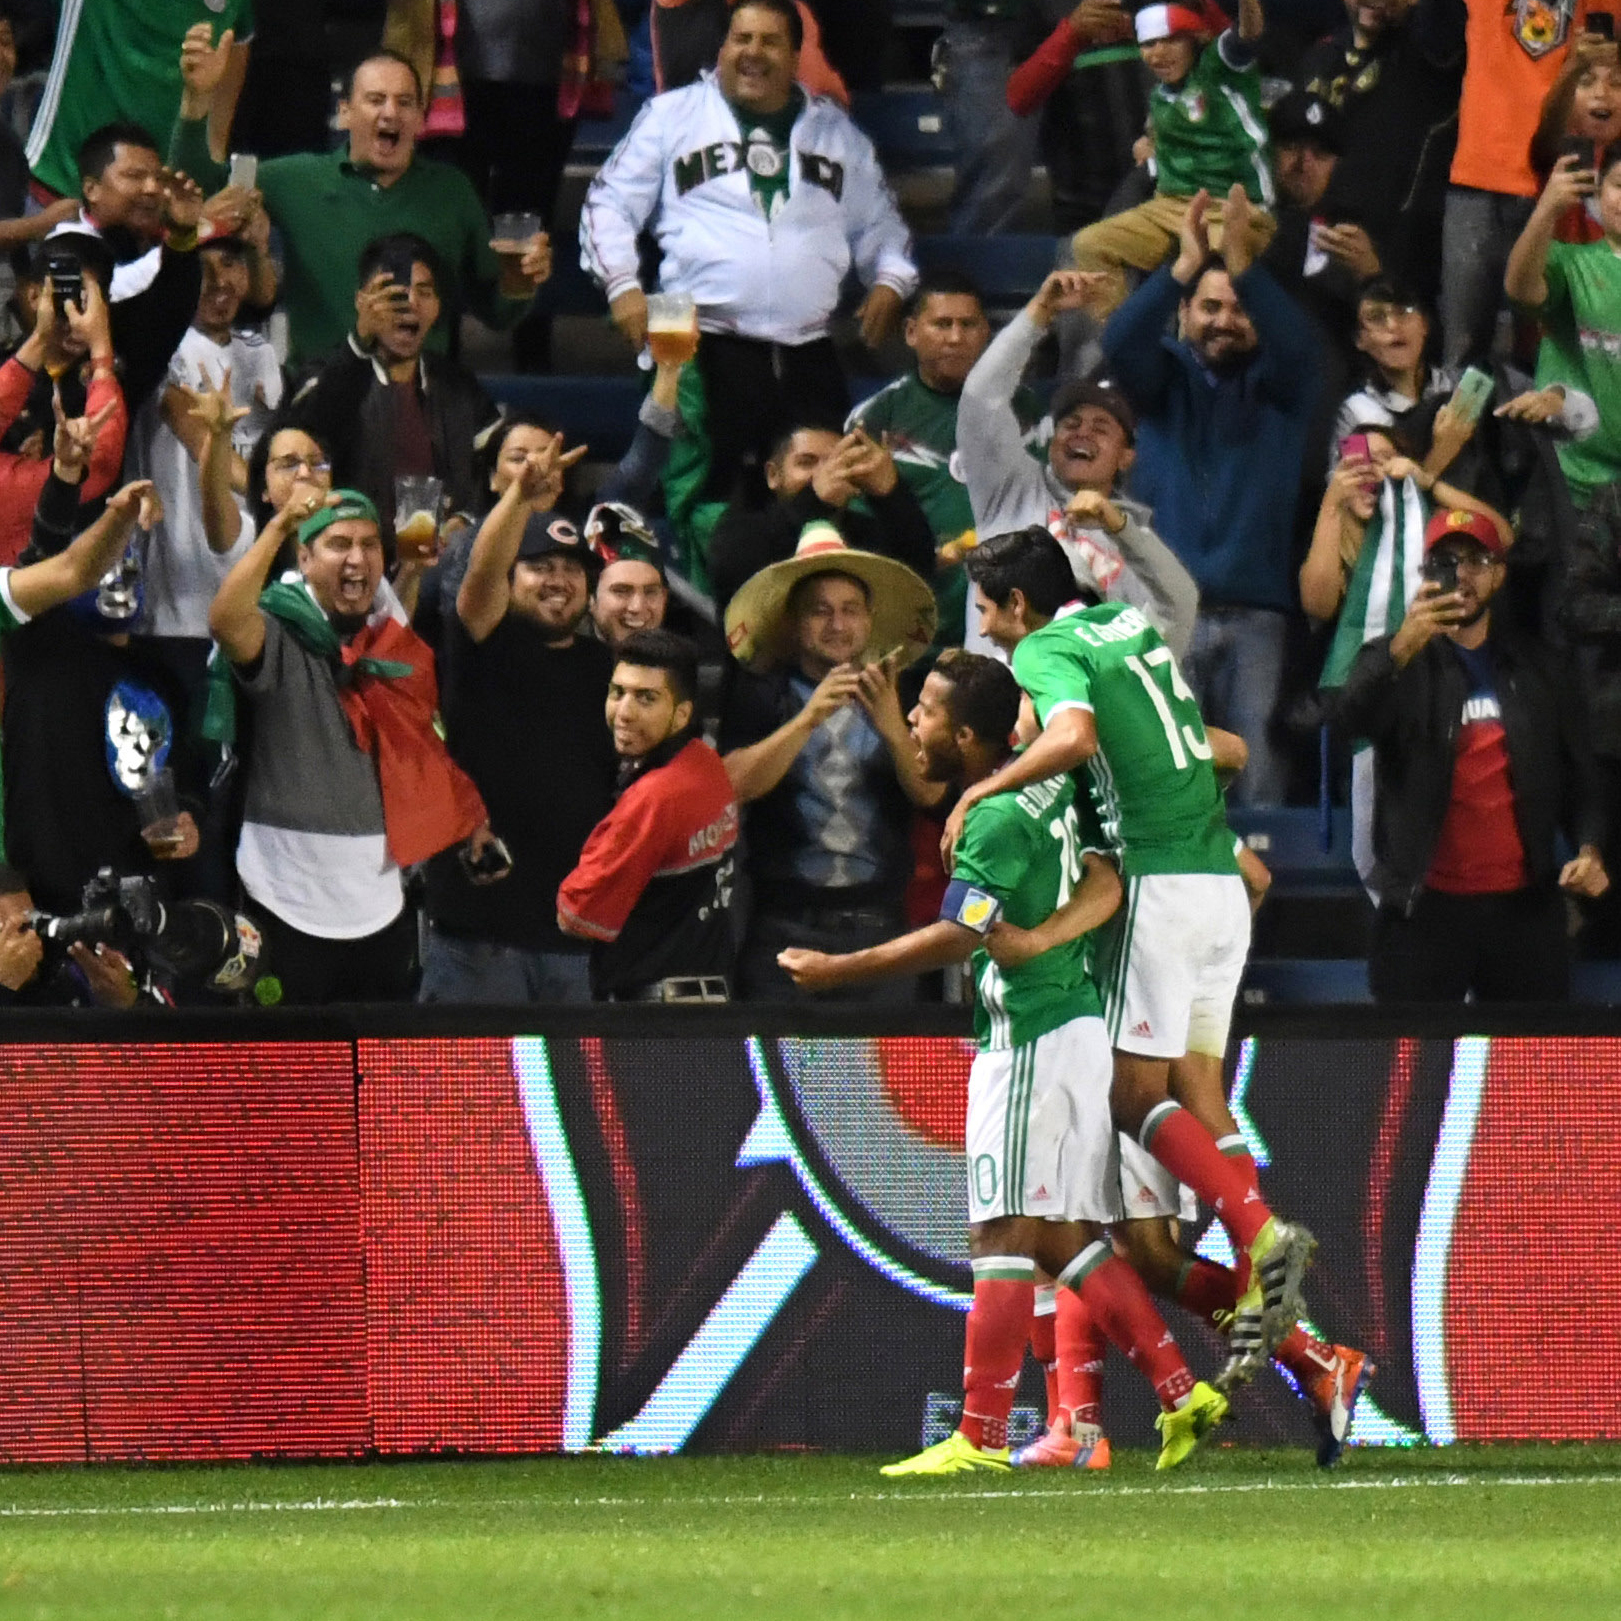 Mexico vs peru 2019 amistoso online dating